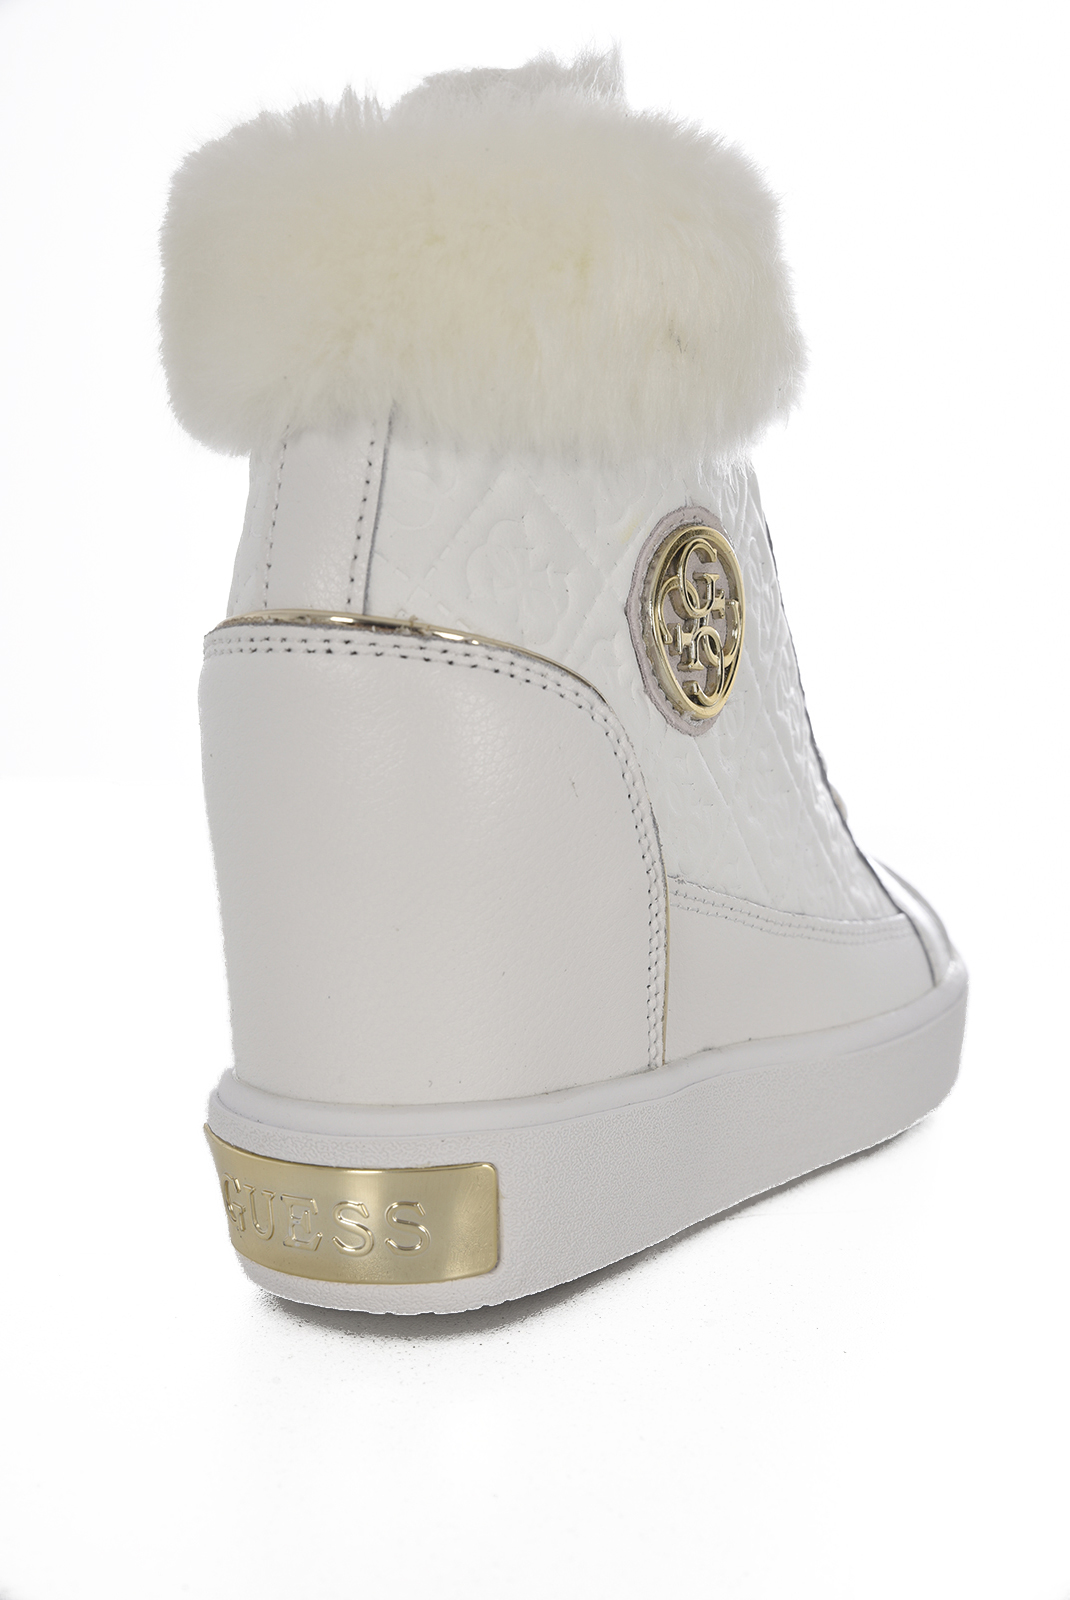 Baskets / Sneakers  Guess jeans FURR FLFRR3 LEP12 WHITE